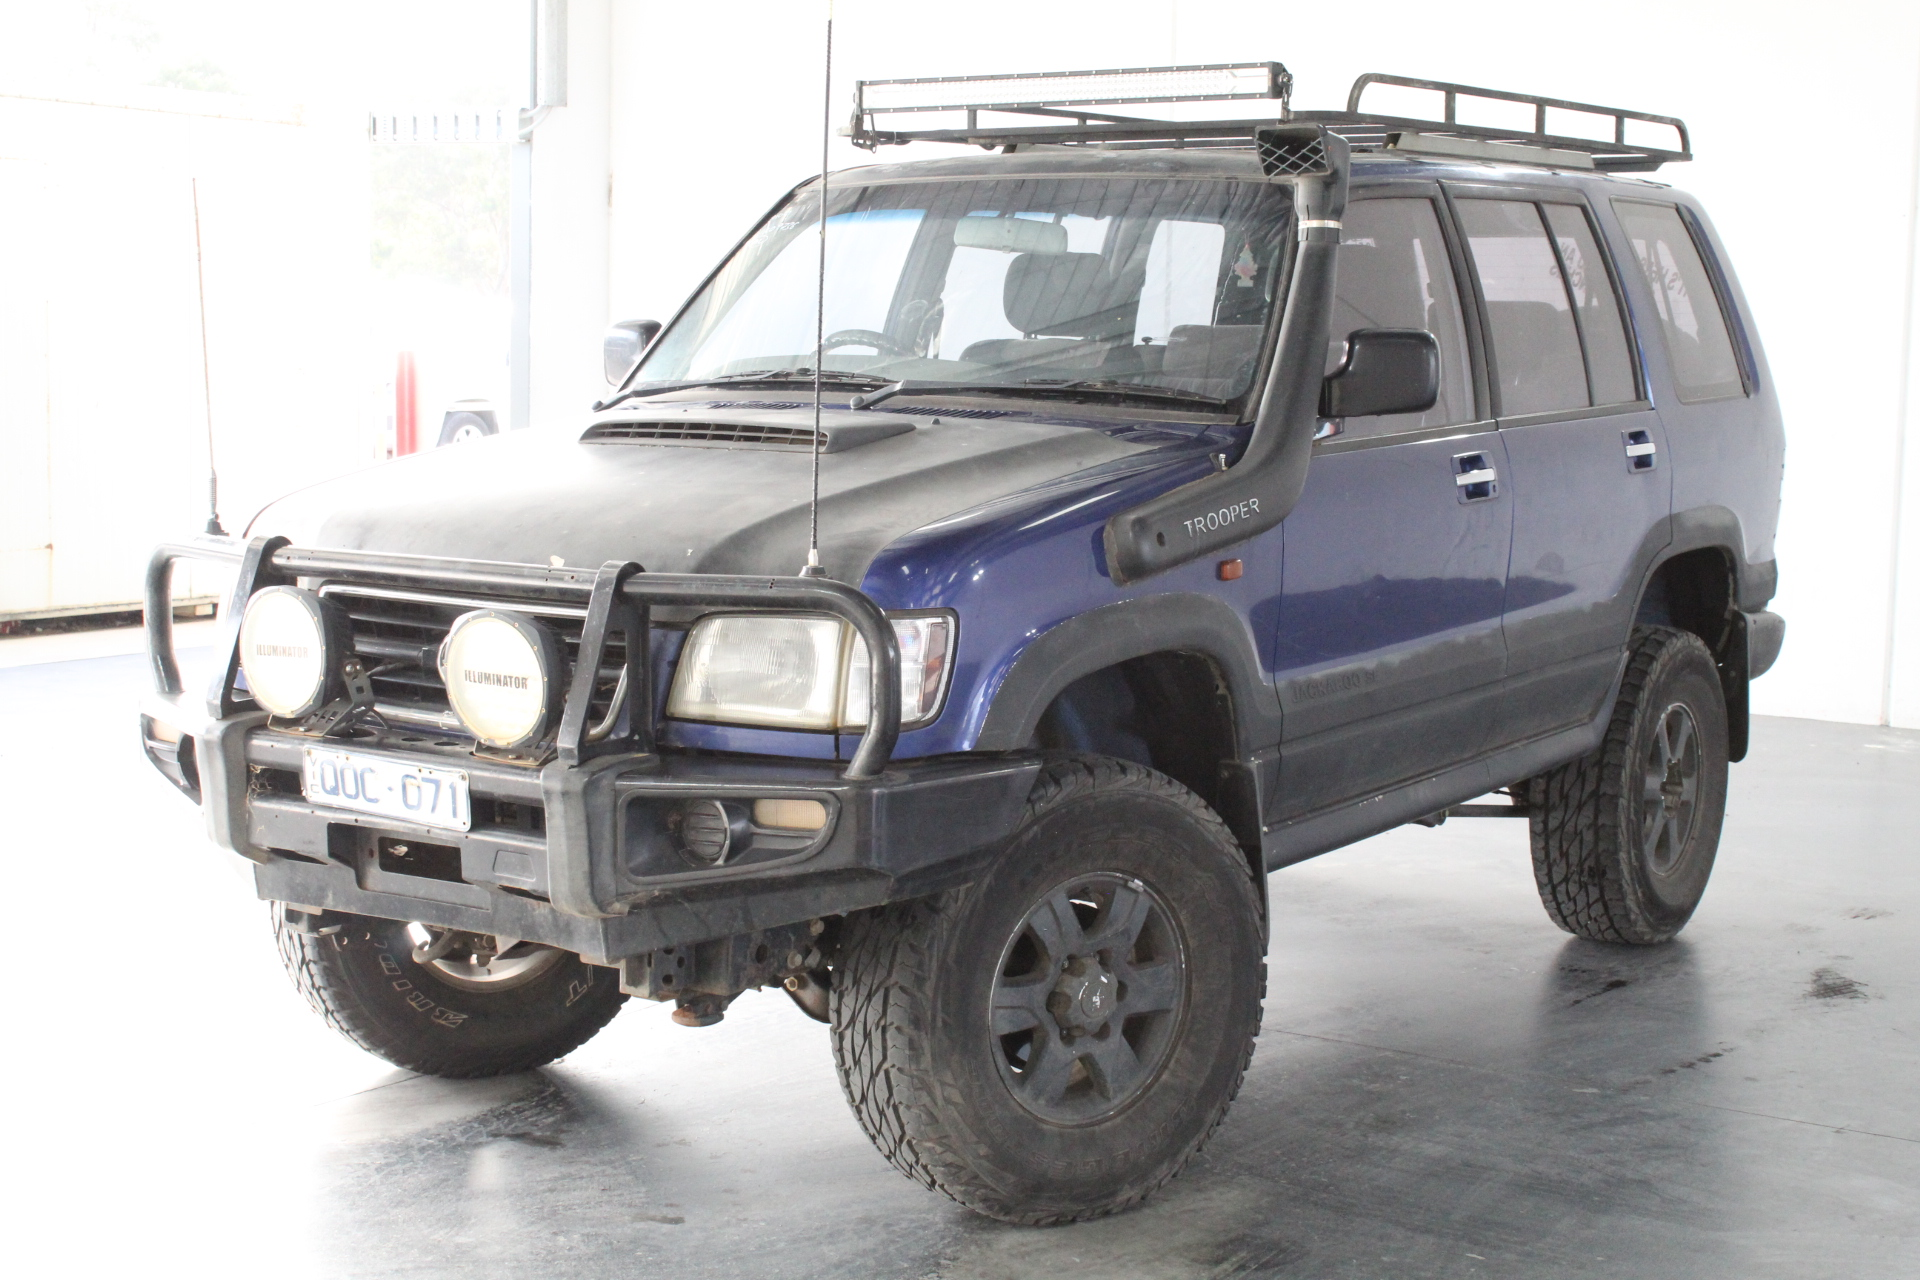 2000 Holden Jackaroo Se Lwb 4x4 Automatic 7 Seats Wagon Auction 0001 3464374 Graysonline Australia